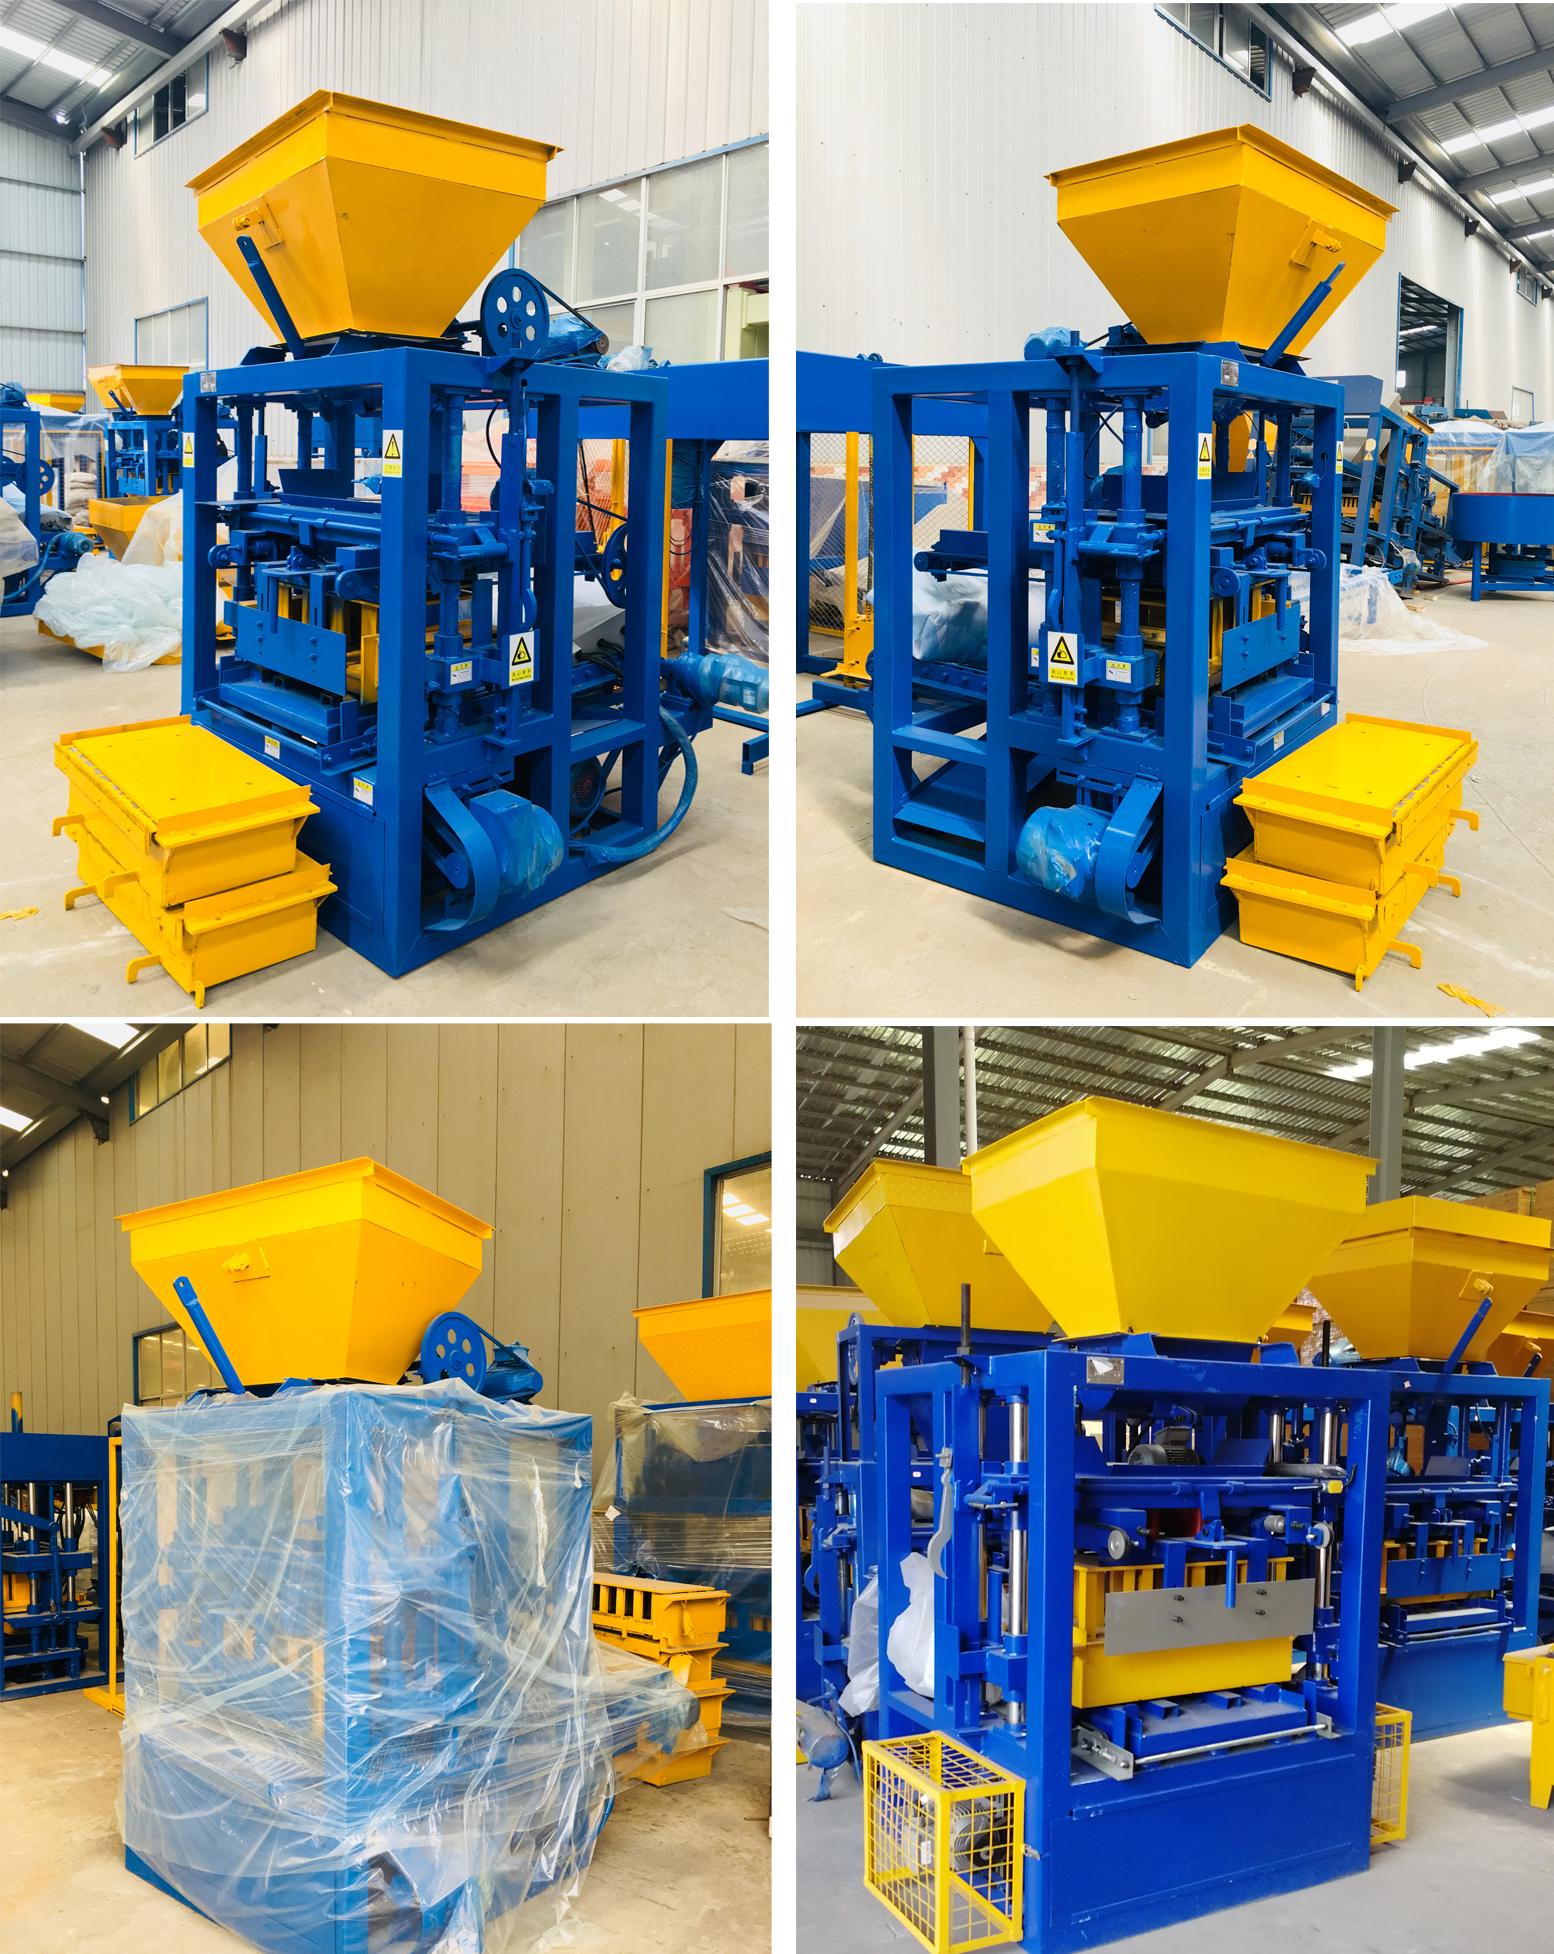 QT4-24 concrete stationary hollow block making machine price